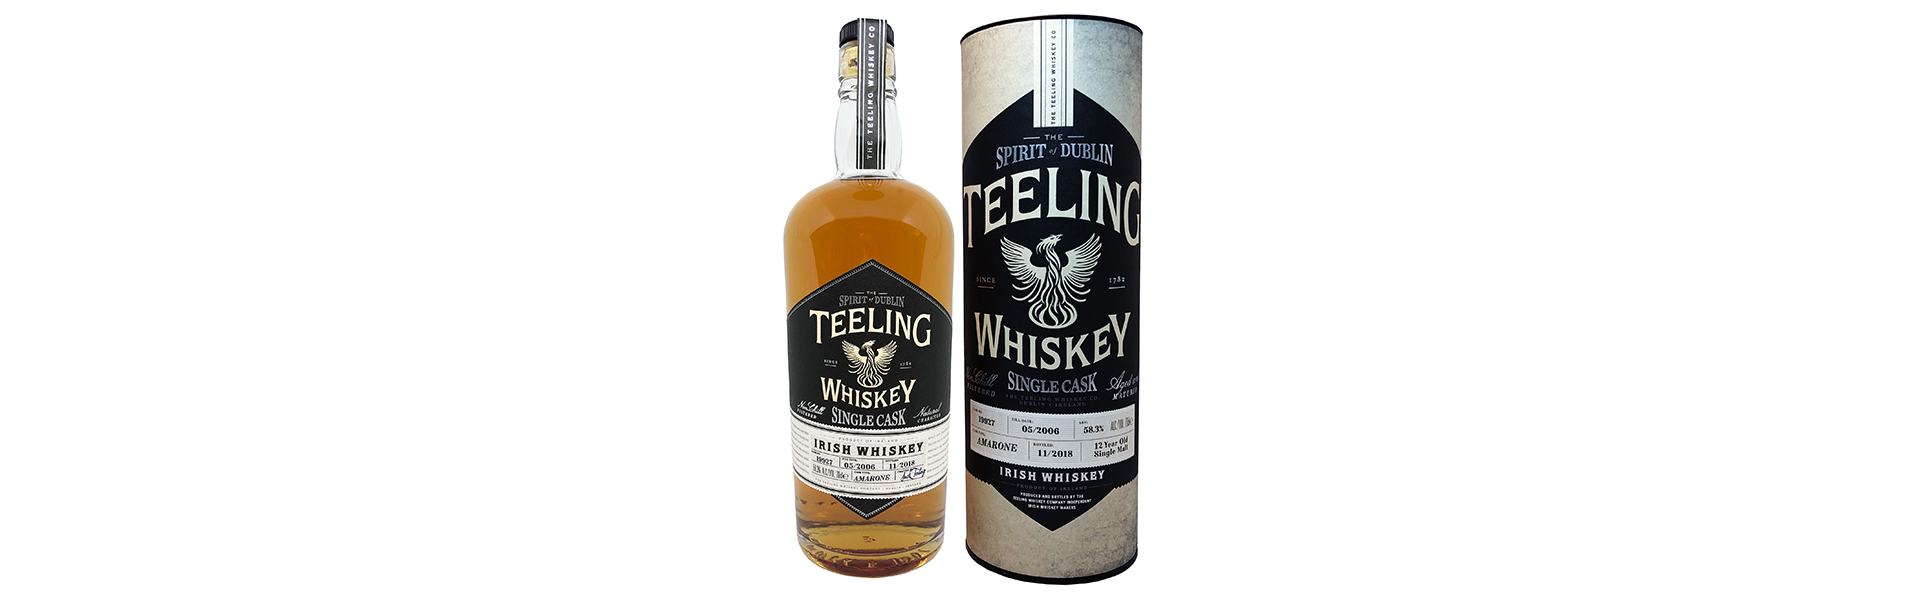 Teeling Whiskey lanserar unik 12-årig Amarone Cask på Systembolaget.